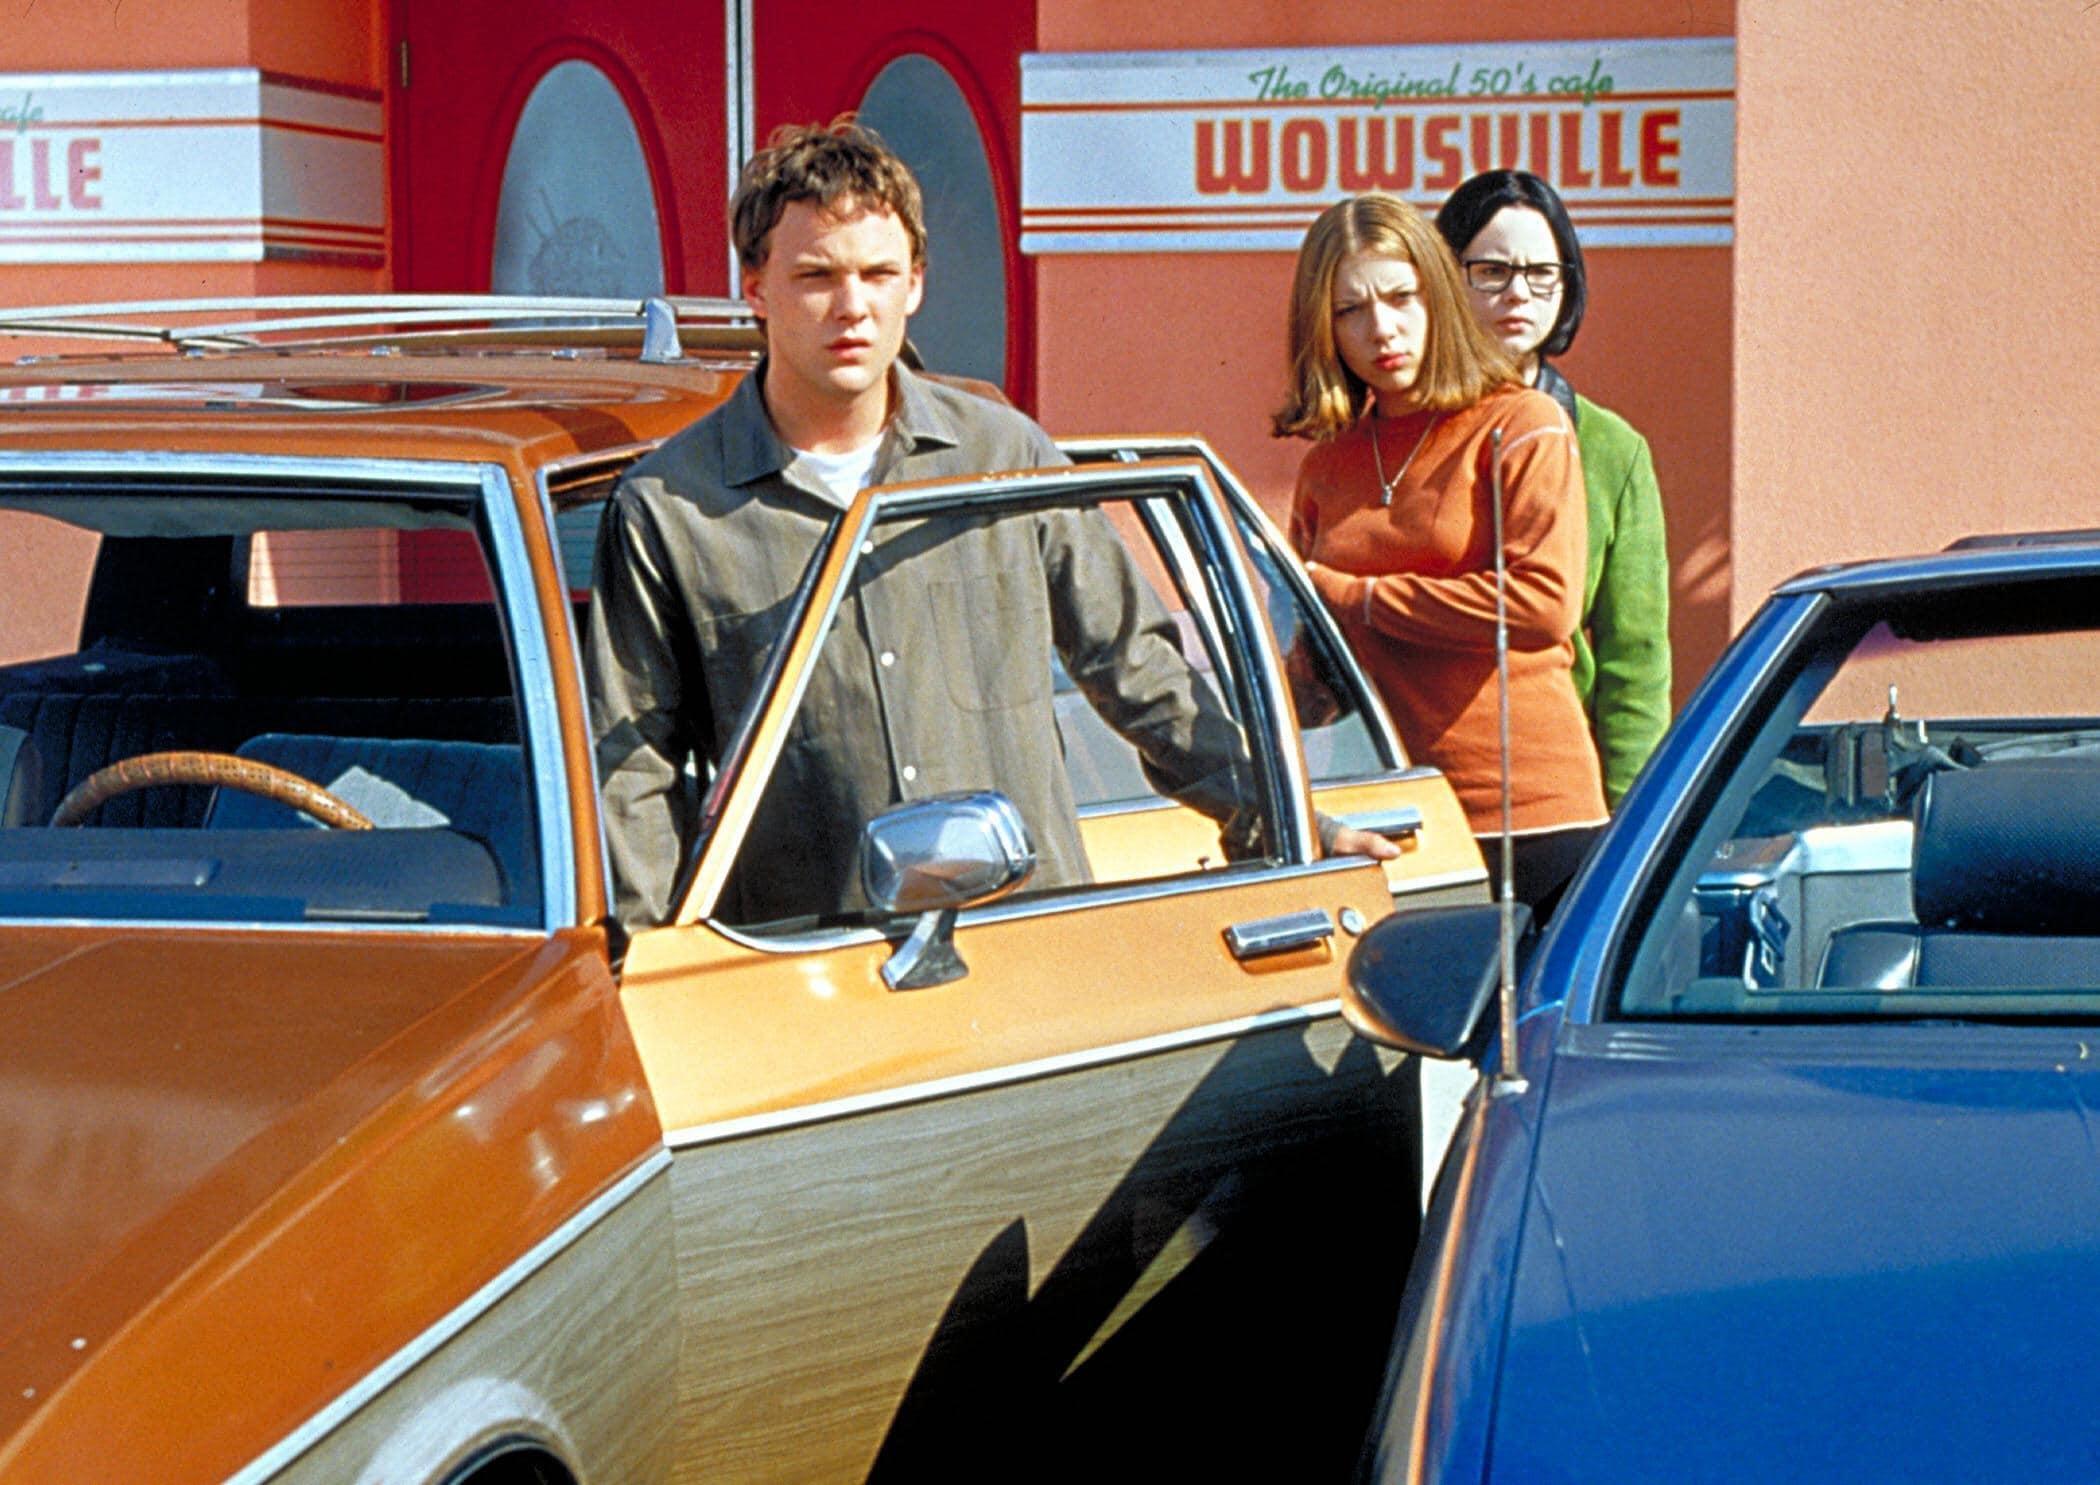 Brad Renfro as Josh, Scarlett Johansson as Rebecca Doppelmeyer, and Thora Birch as Enid Coleslaw in Ghost World